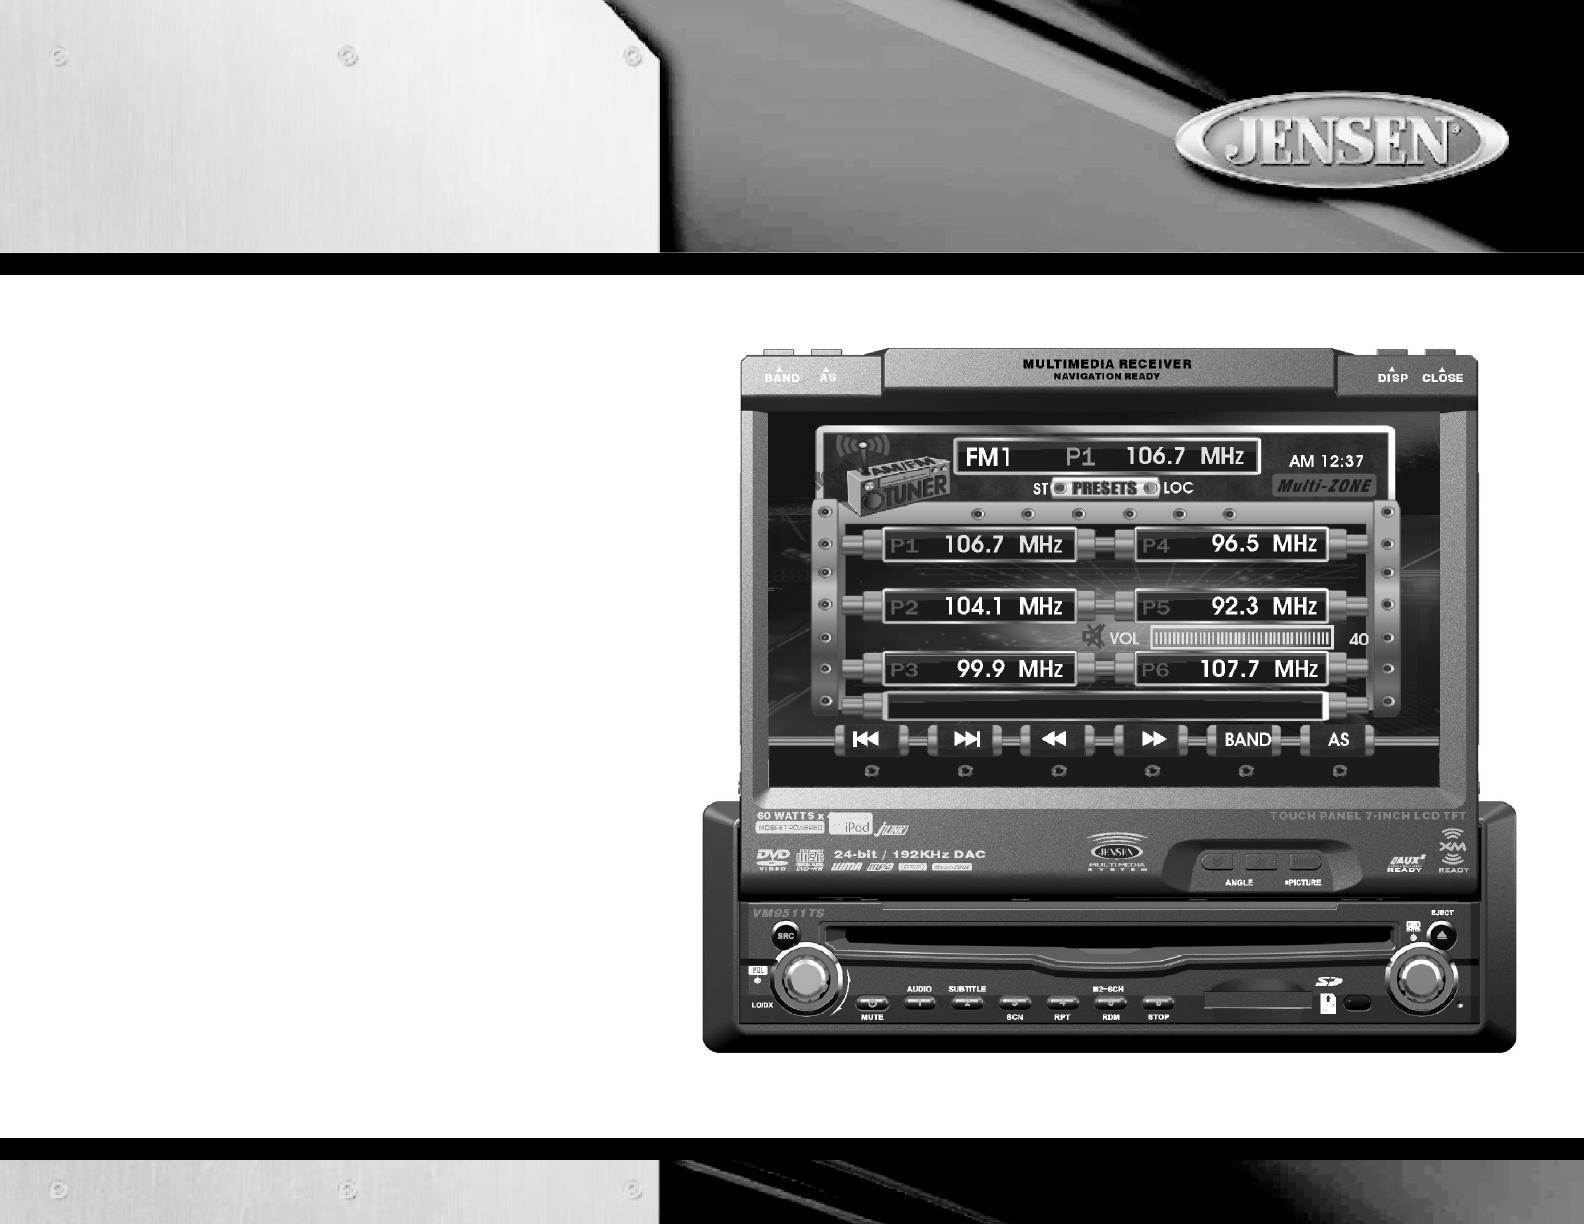 Jensen Tools Vm9511Ts Users Manual VM9411 on